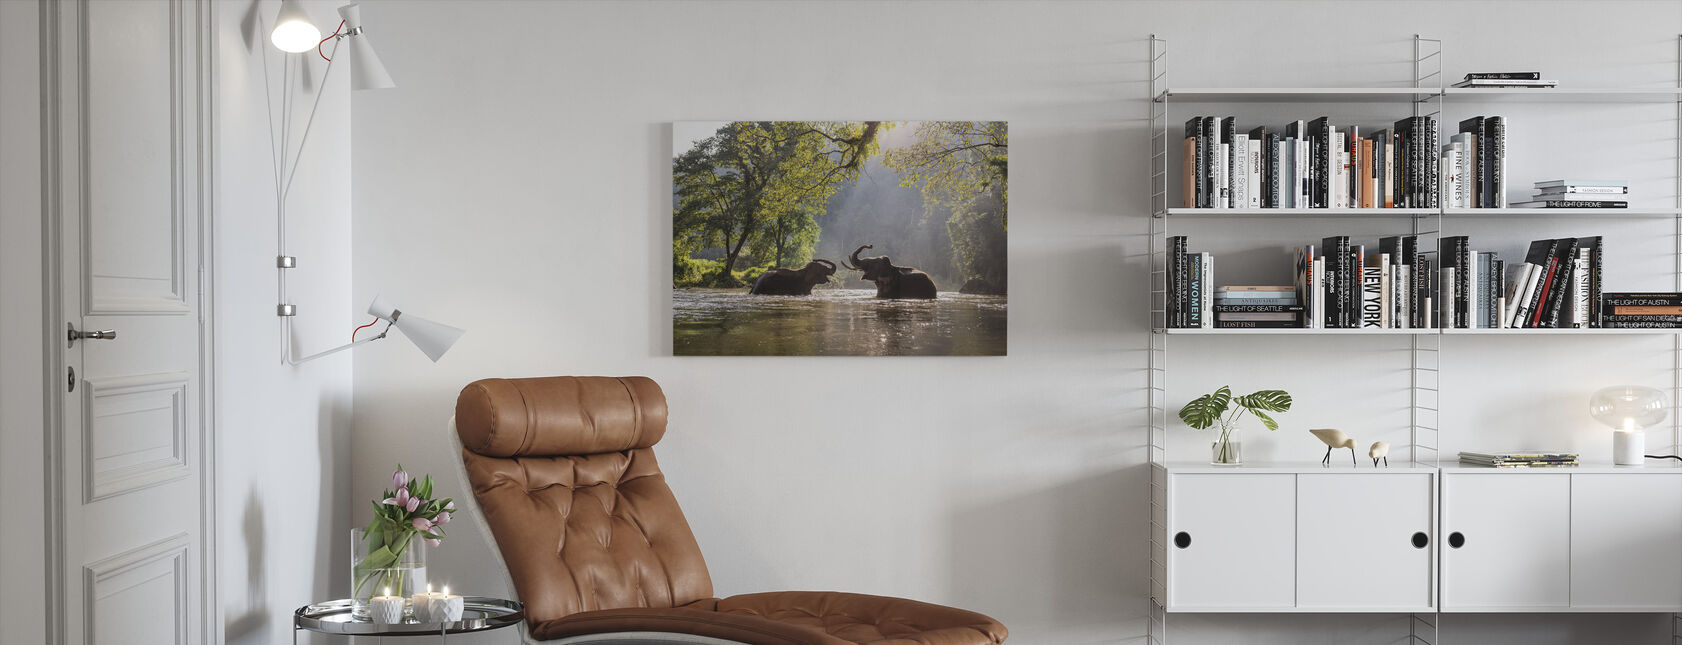 Olifant spelen water - Canvas print - Woonkamer